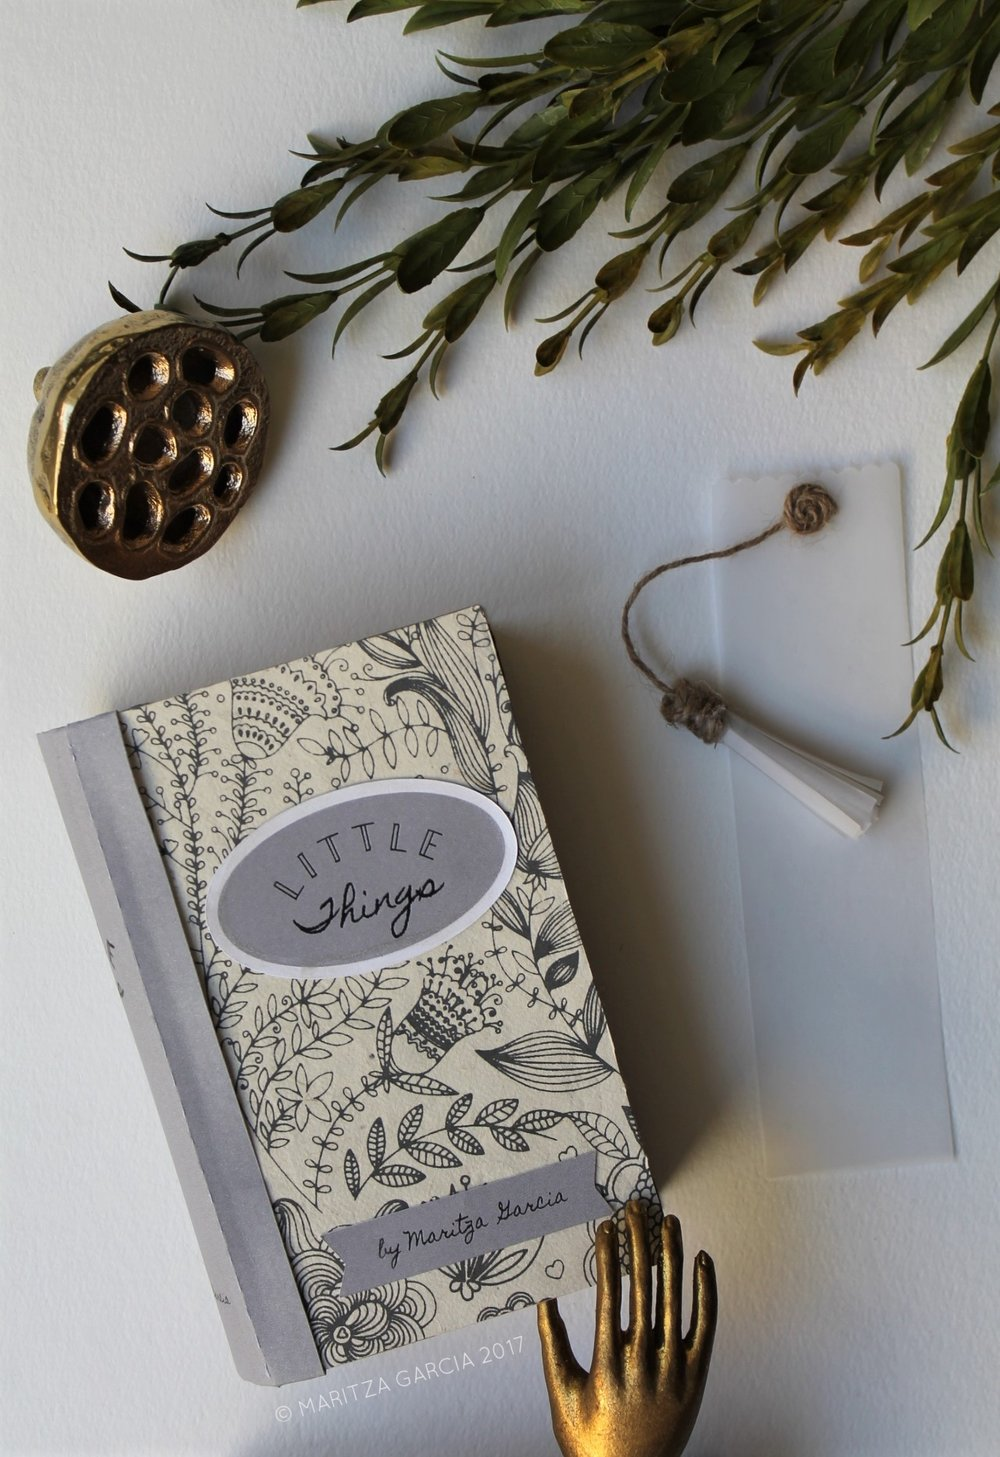 Silhouette Hidden Compartment Book Box | maritzagarcia.website